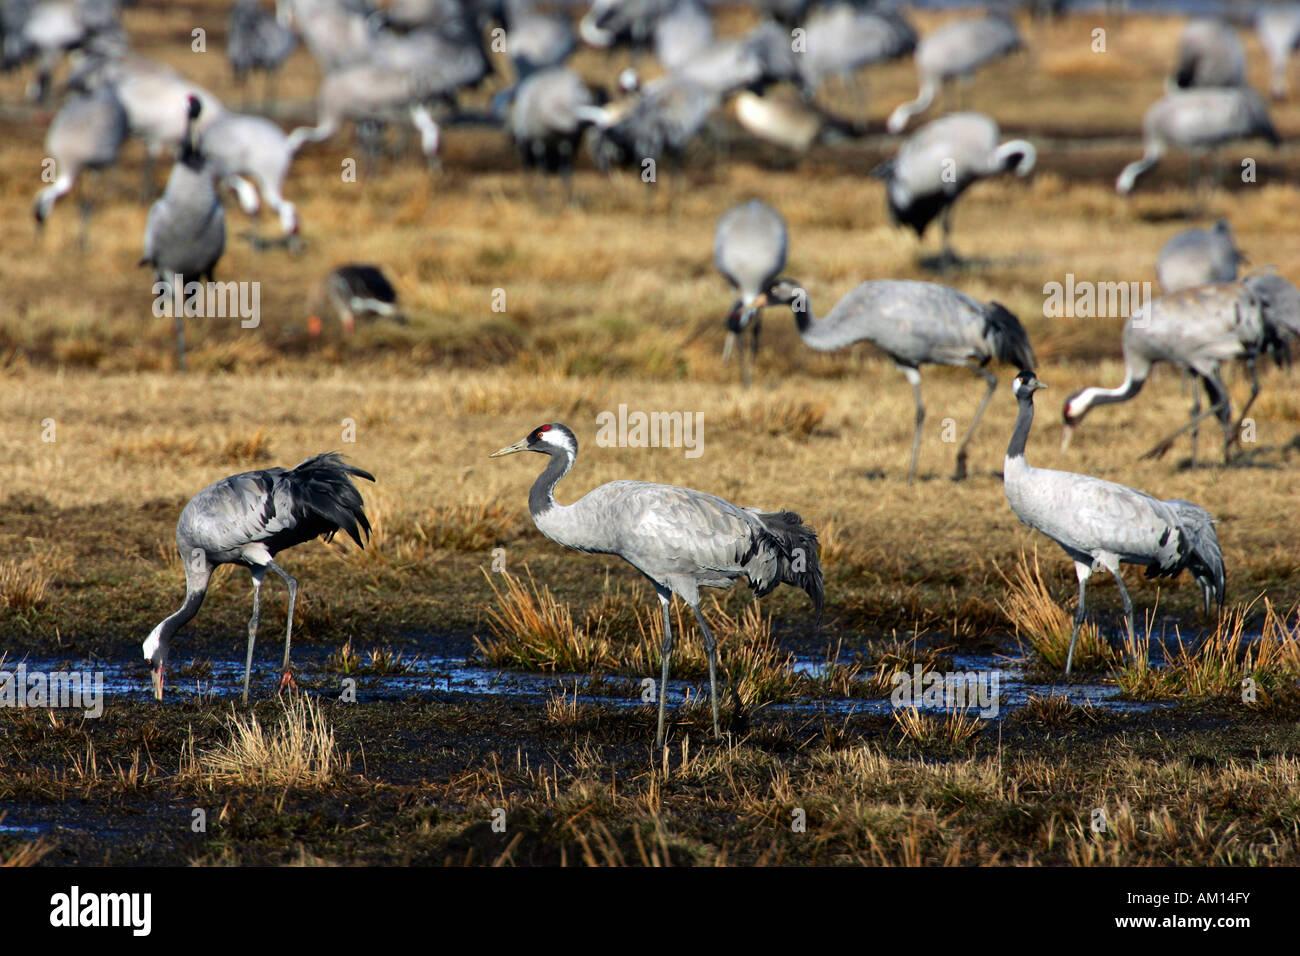 Resting common cranes (Grus grus) at lake Hornborga in Sweden - Europe Stock Photo